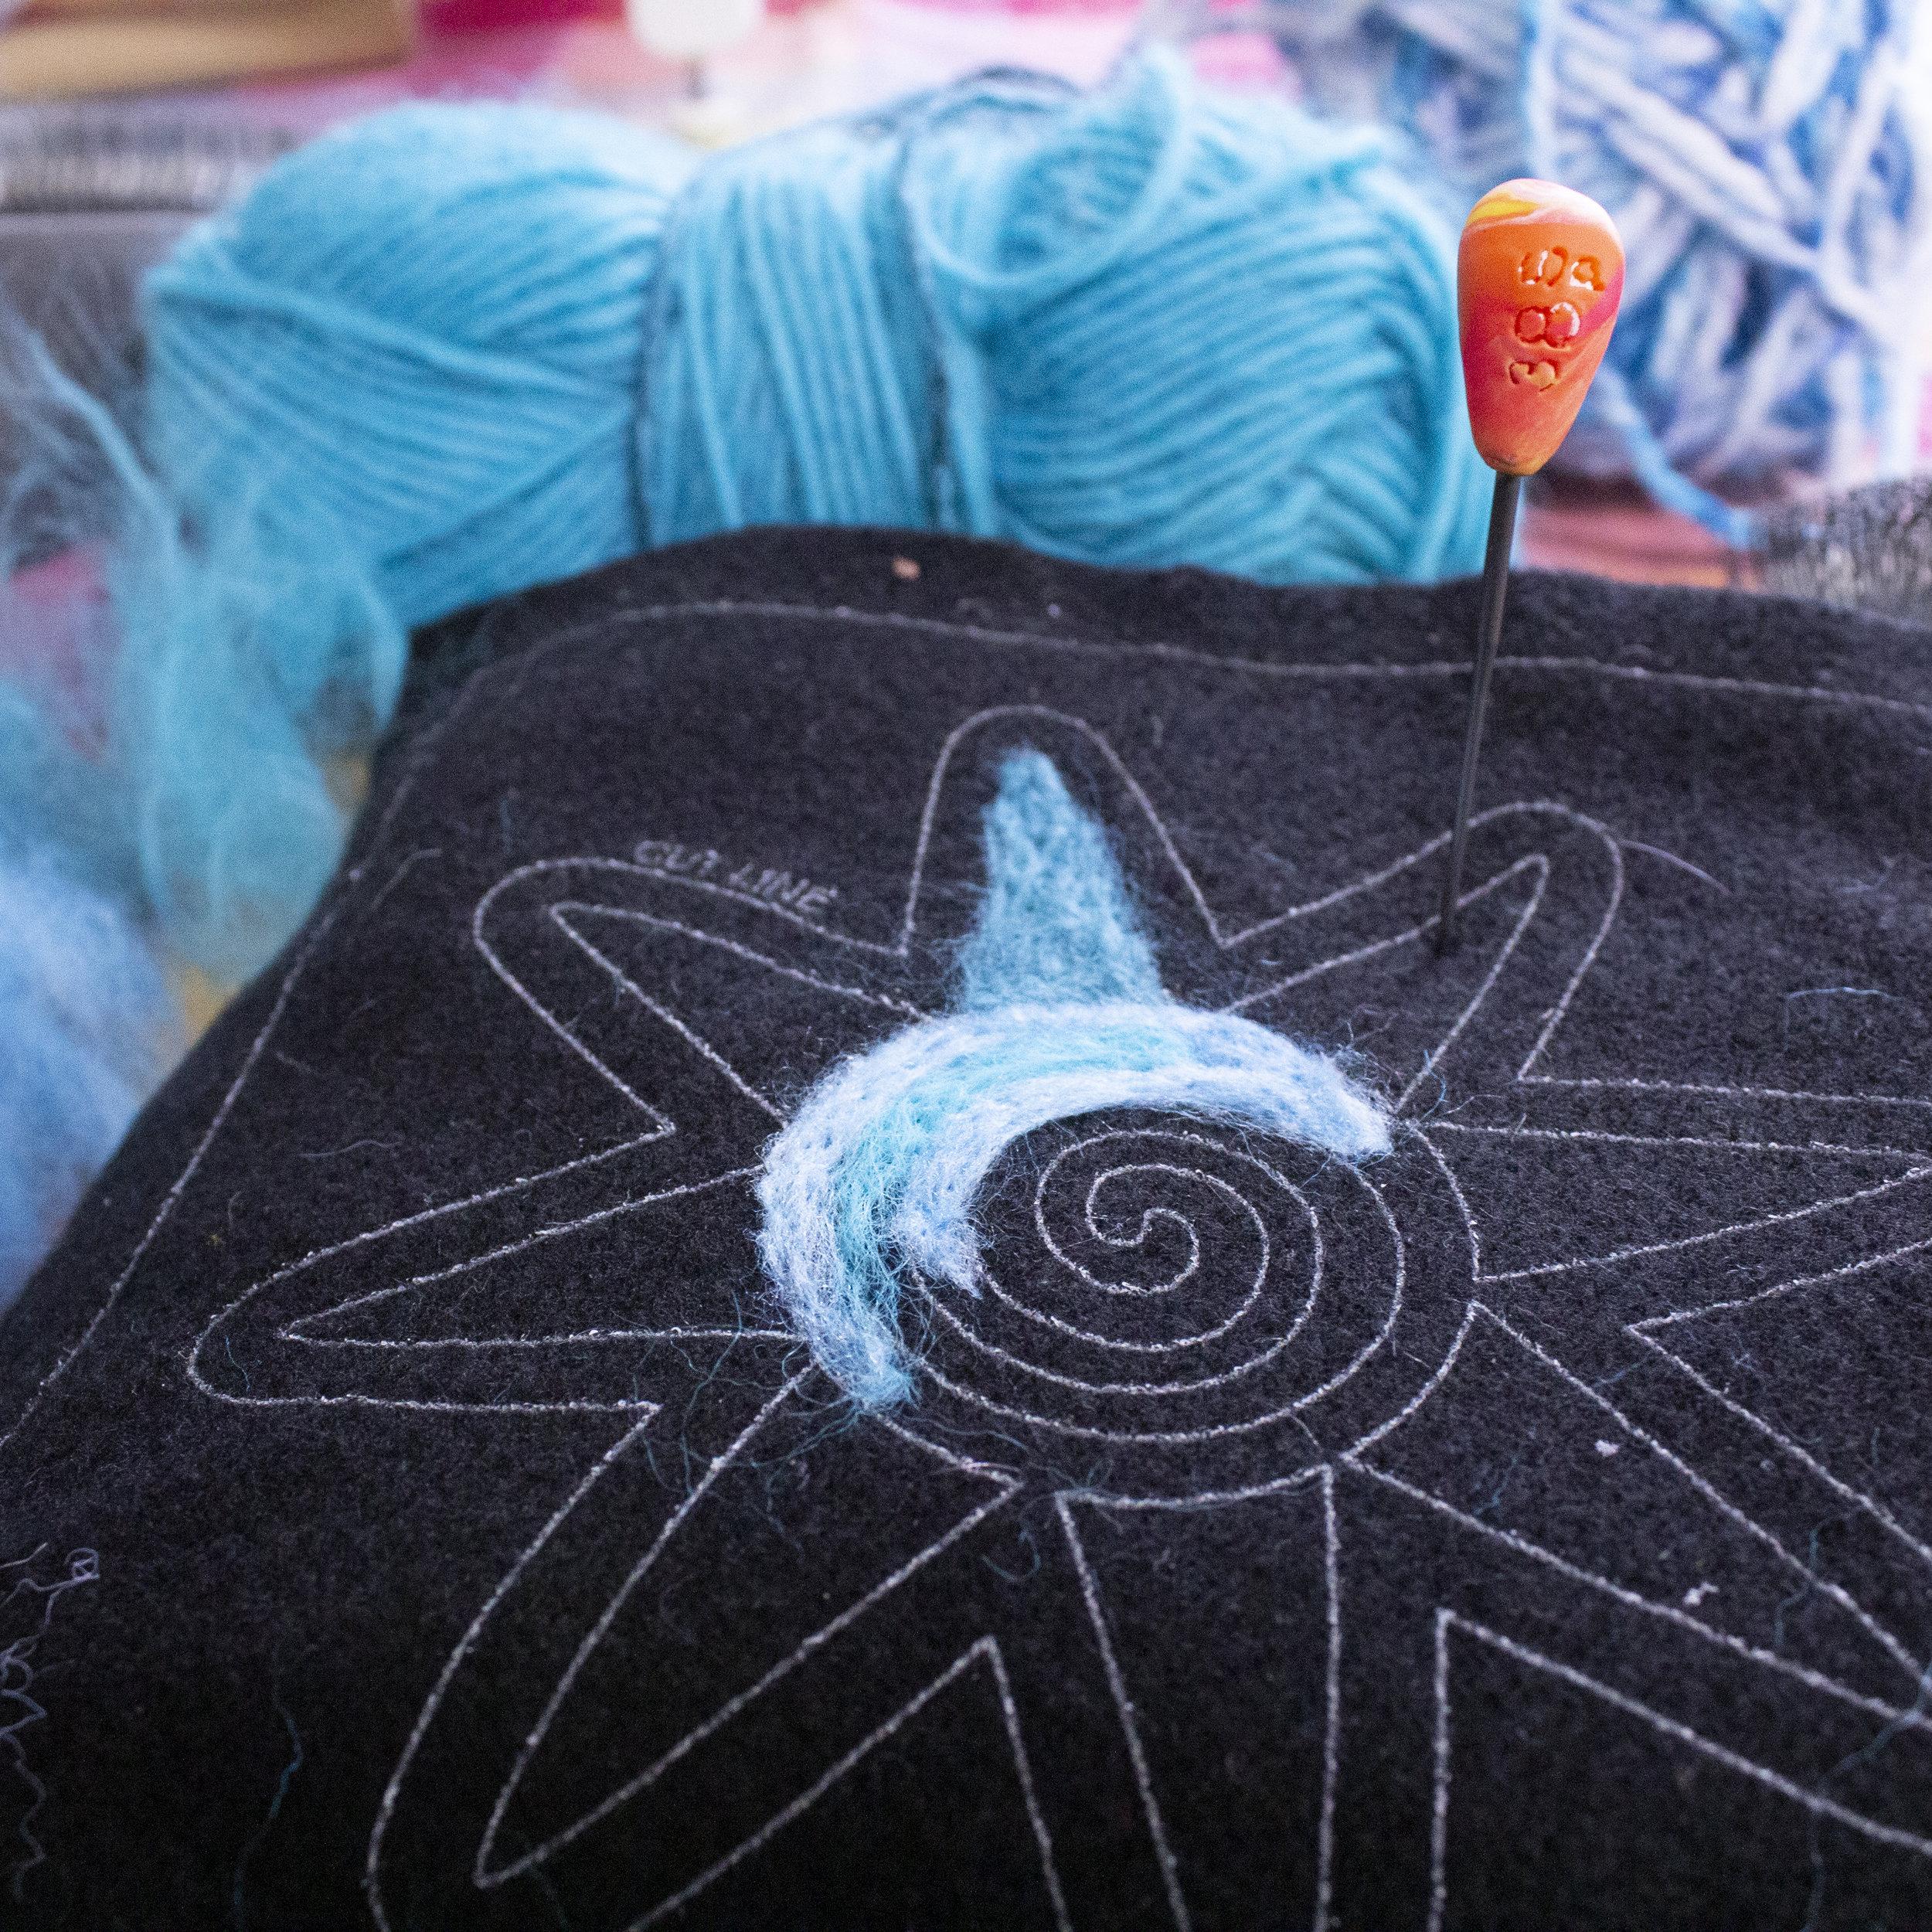 2D needle felting on an applique piece on craft felt using reclaimed yarn fiber.